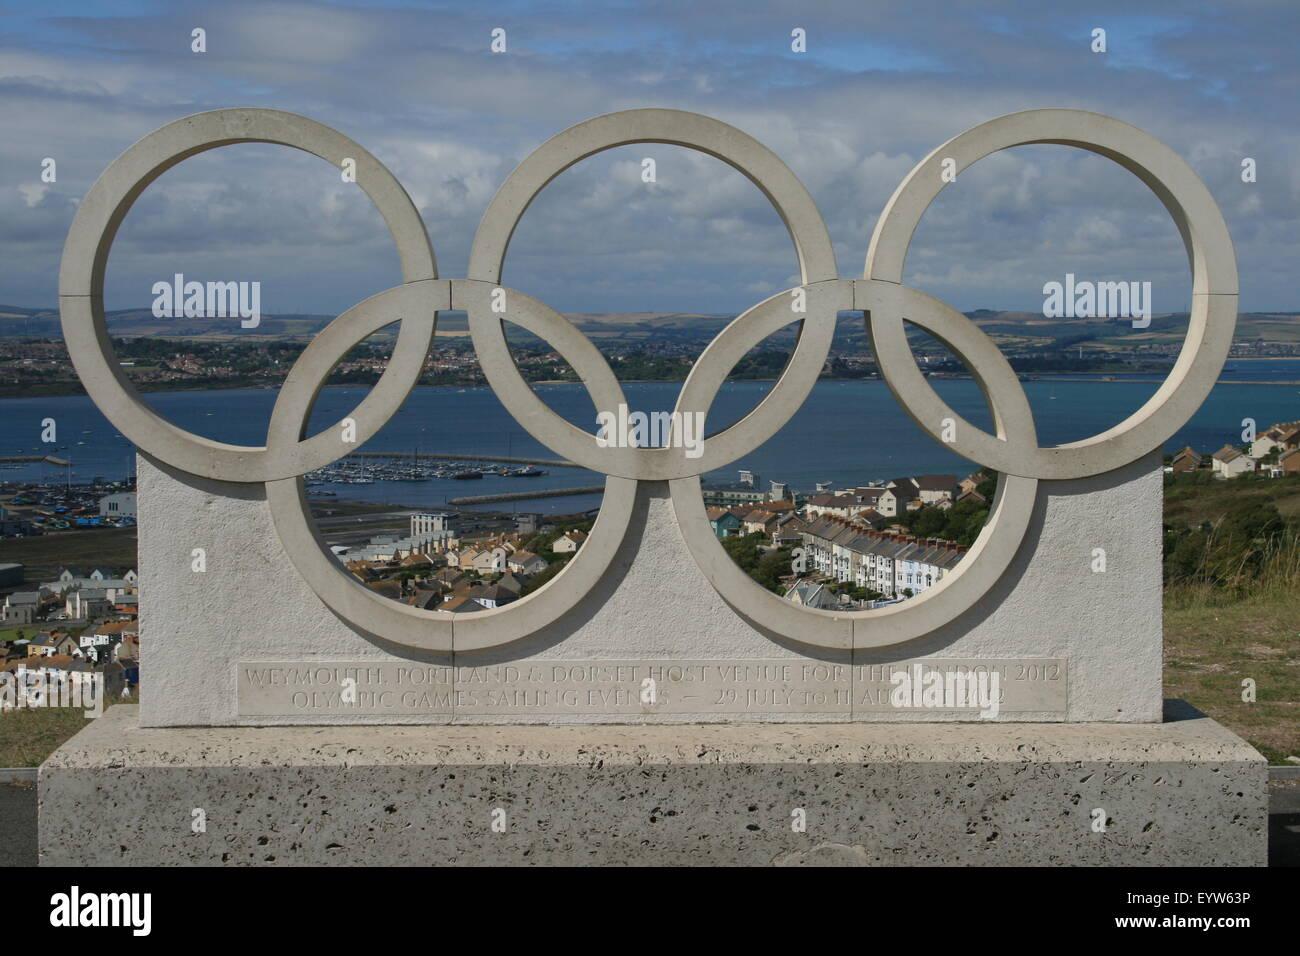 Olympic Rings overlooking Portland - Stock Image